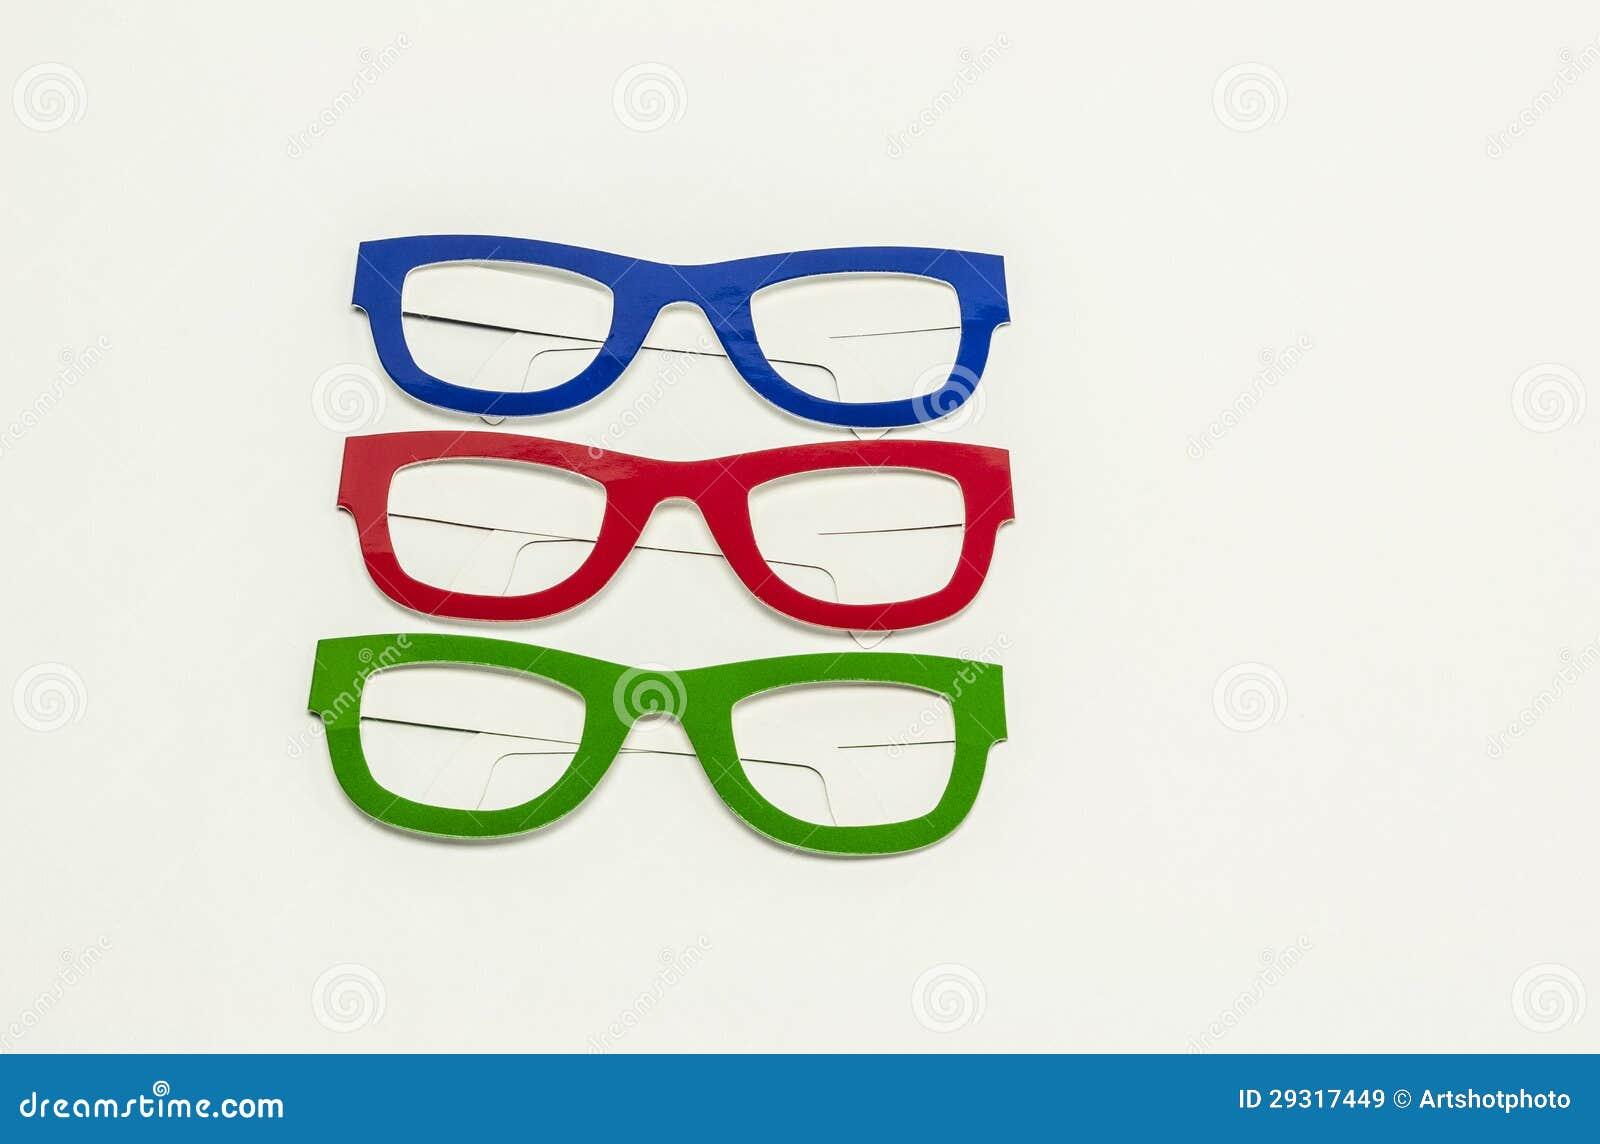 Coloured eyeglasses